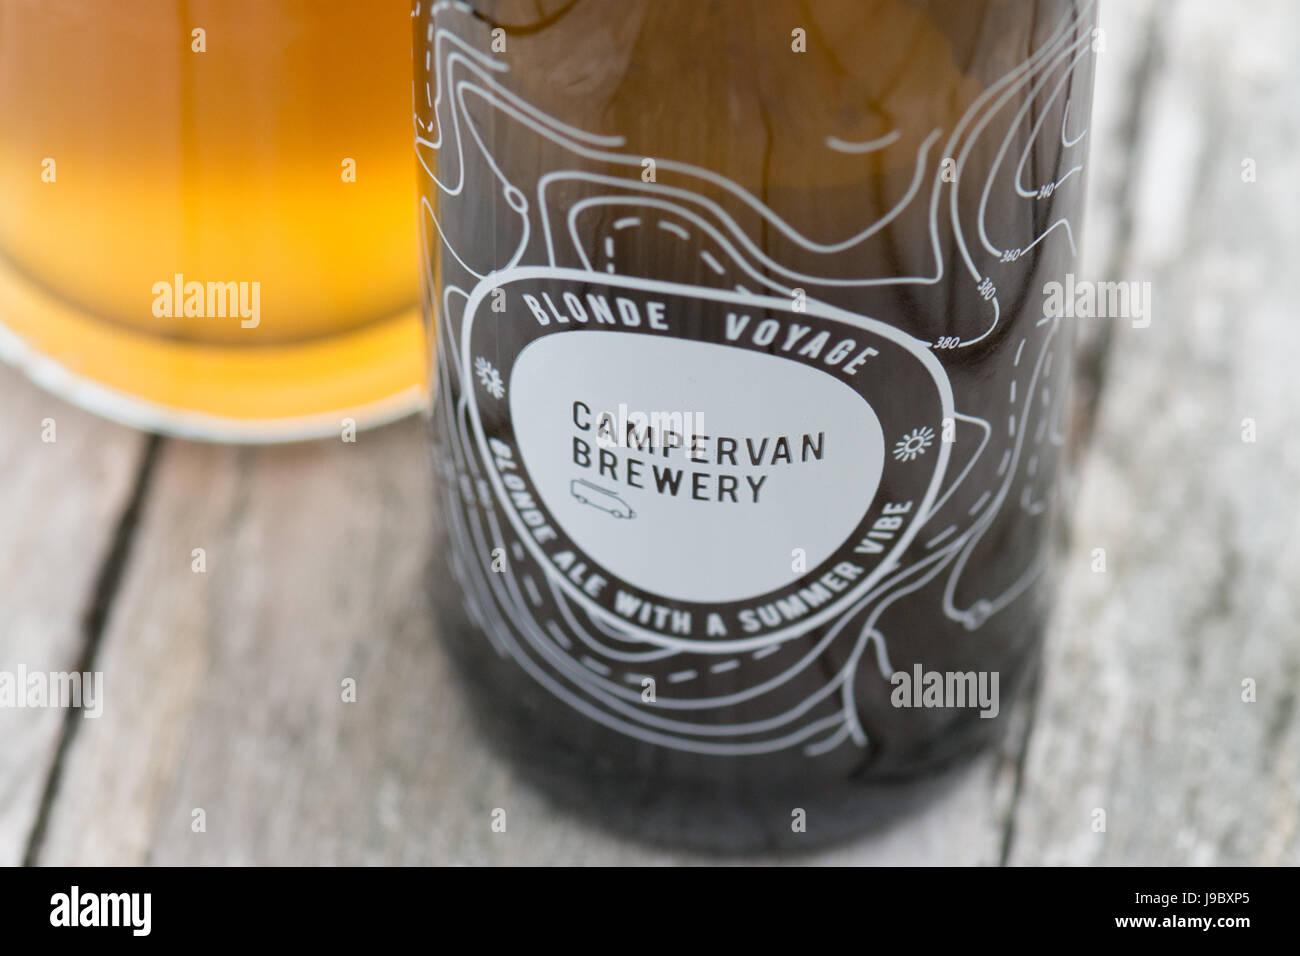 Campervan Brewery - an Edinburgh based craft beer business based around a modified campervan, Scotland, UK - Stock Image